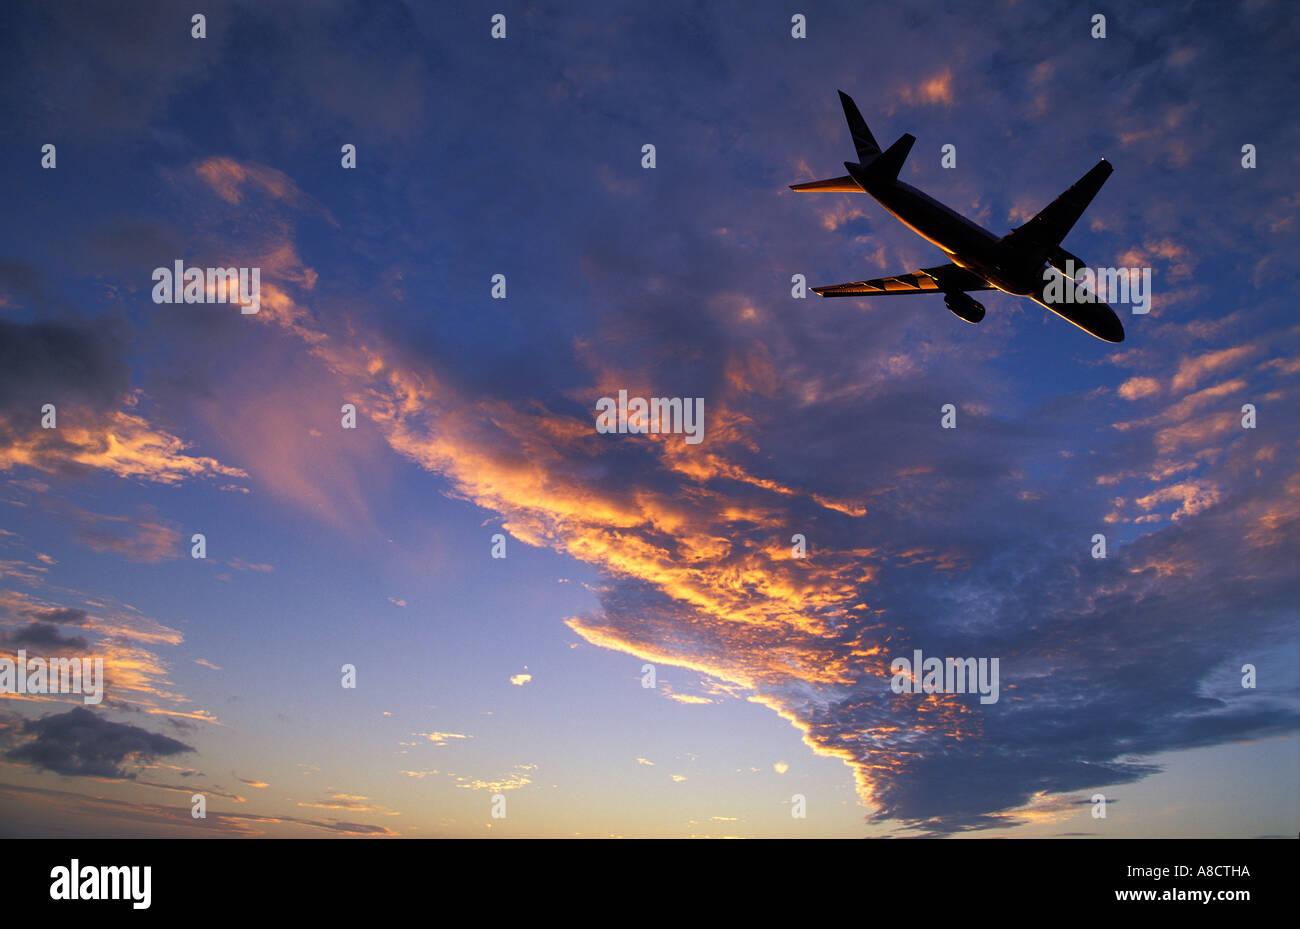 Avion en vol Londres Heathrow Middlesex England UK Photo Stock